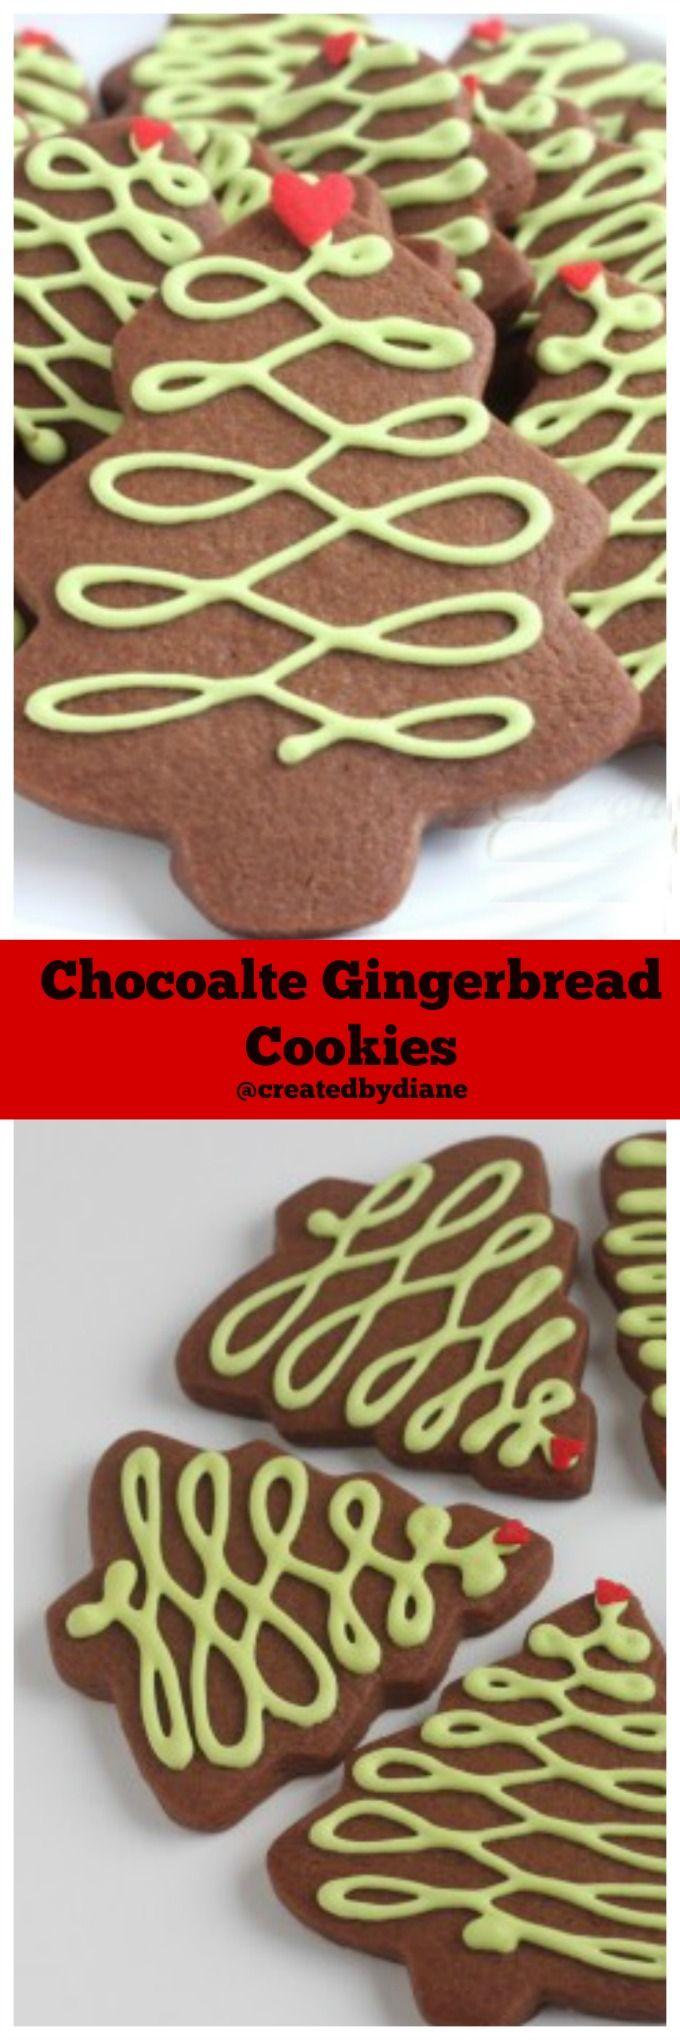 chocolate gingerbread cookies @createdbydiane